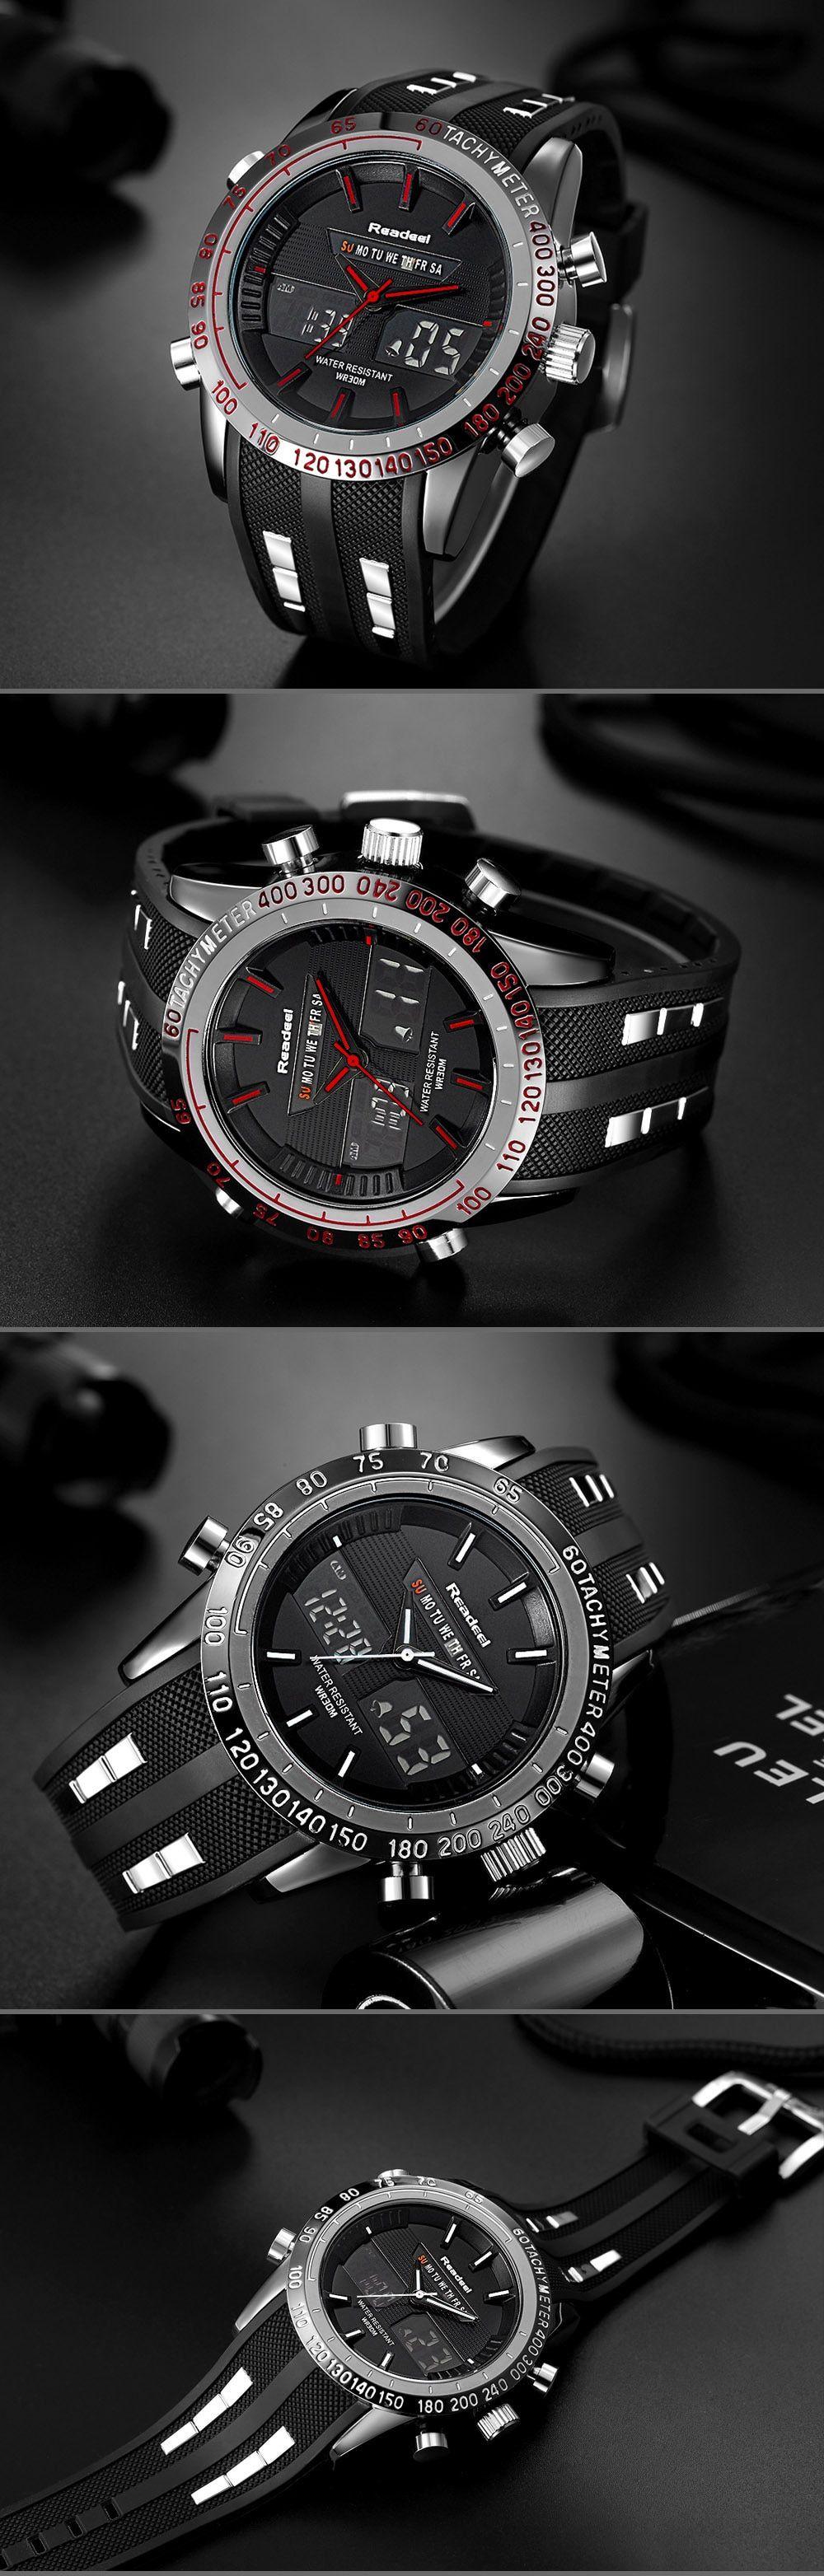 Luxury Brand Watches Men Waterproof Sports Watches